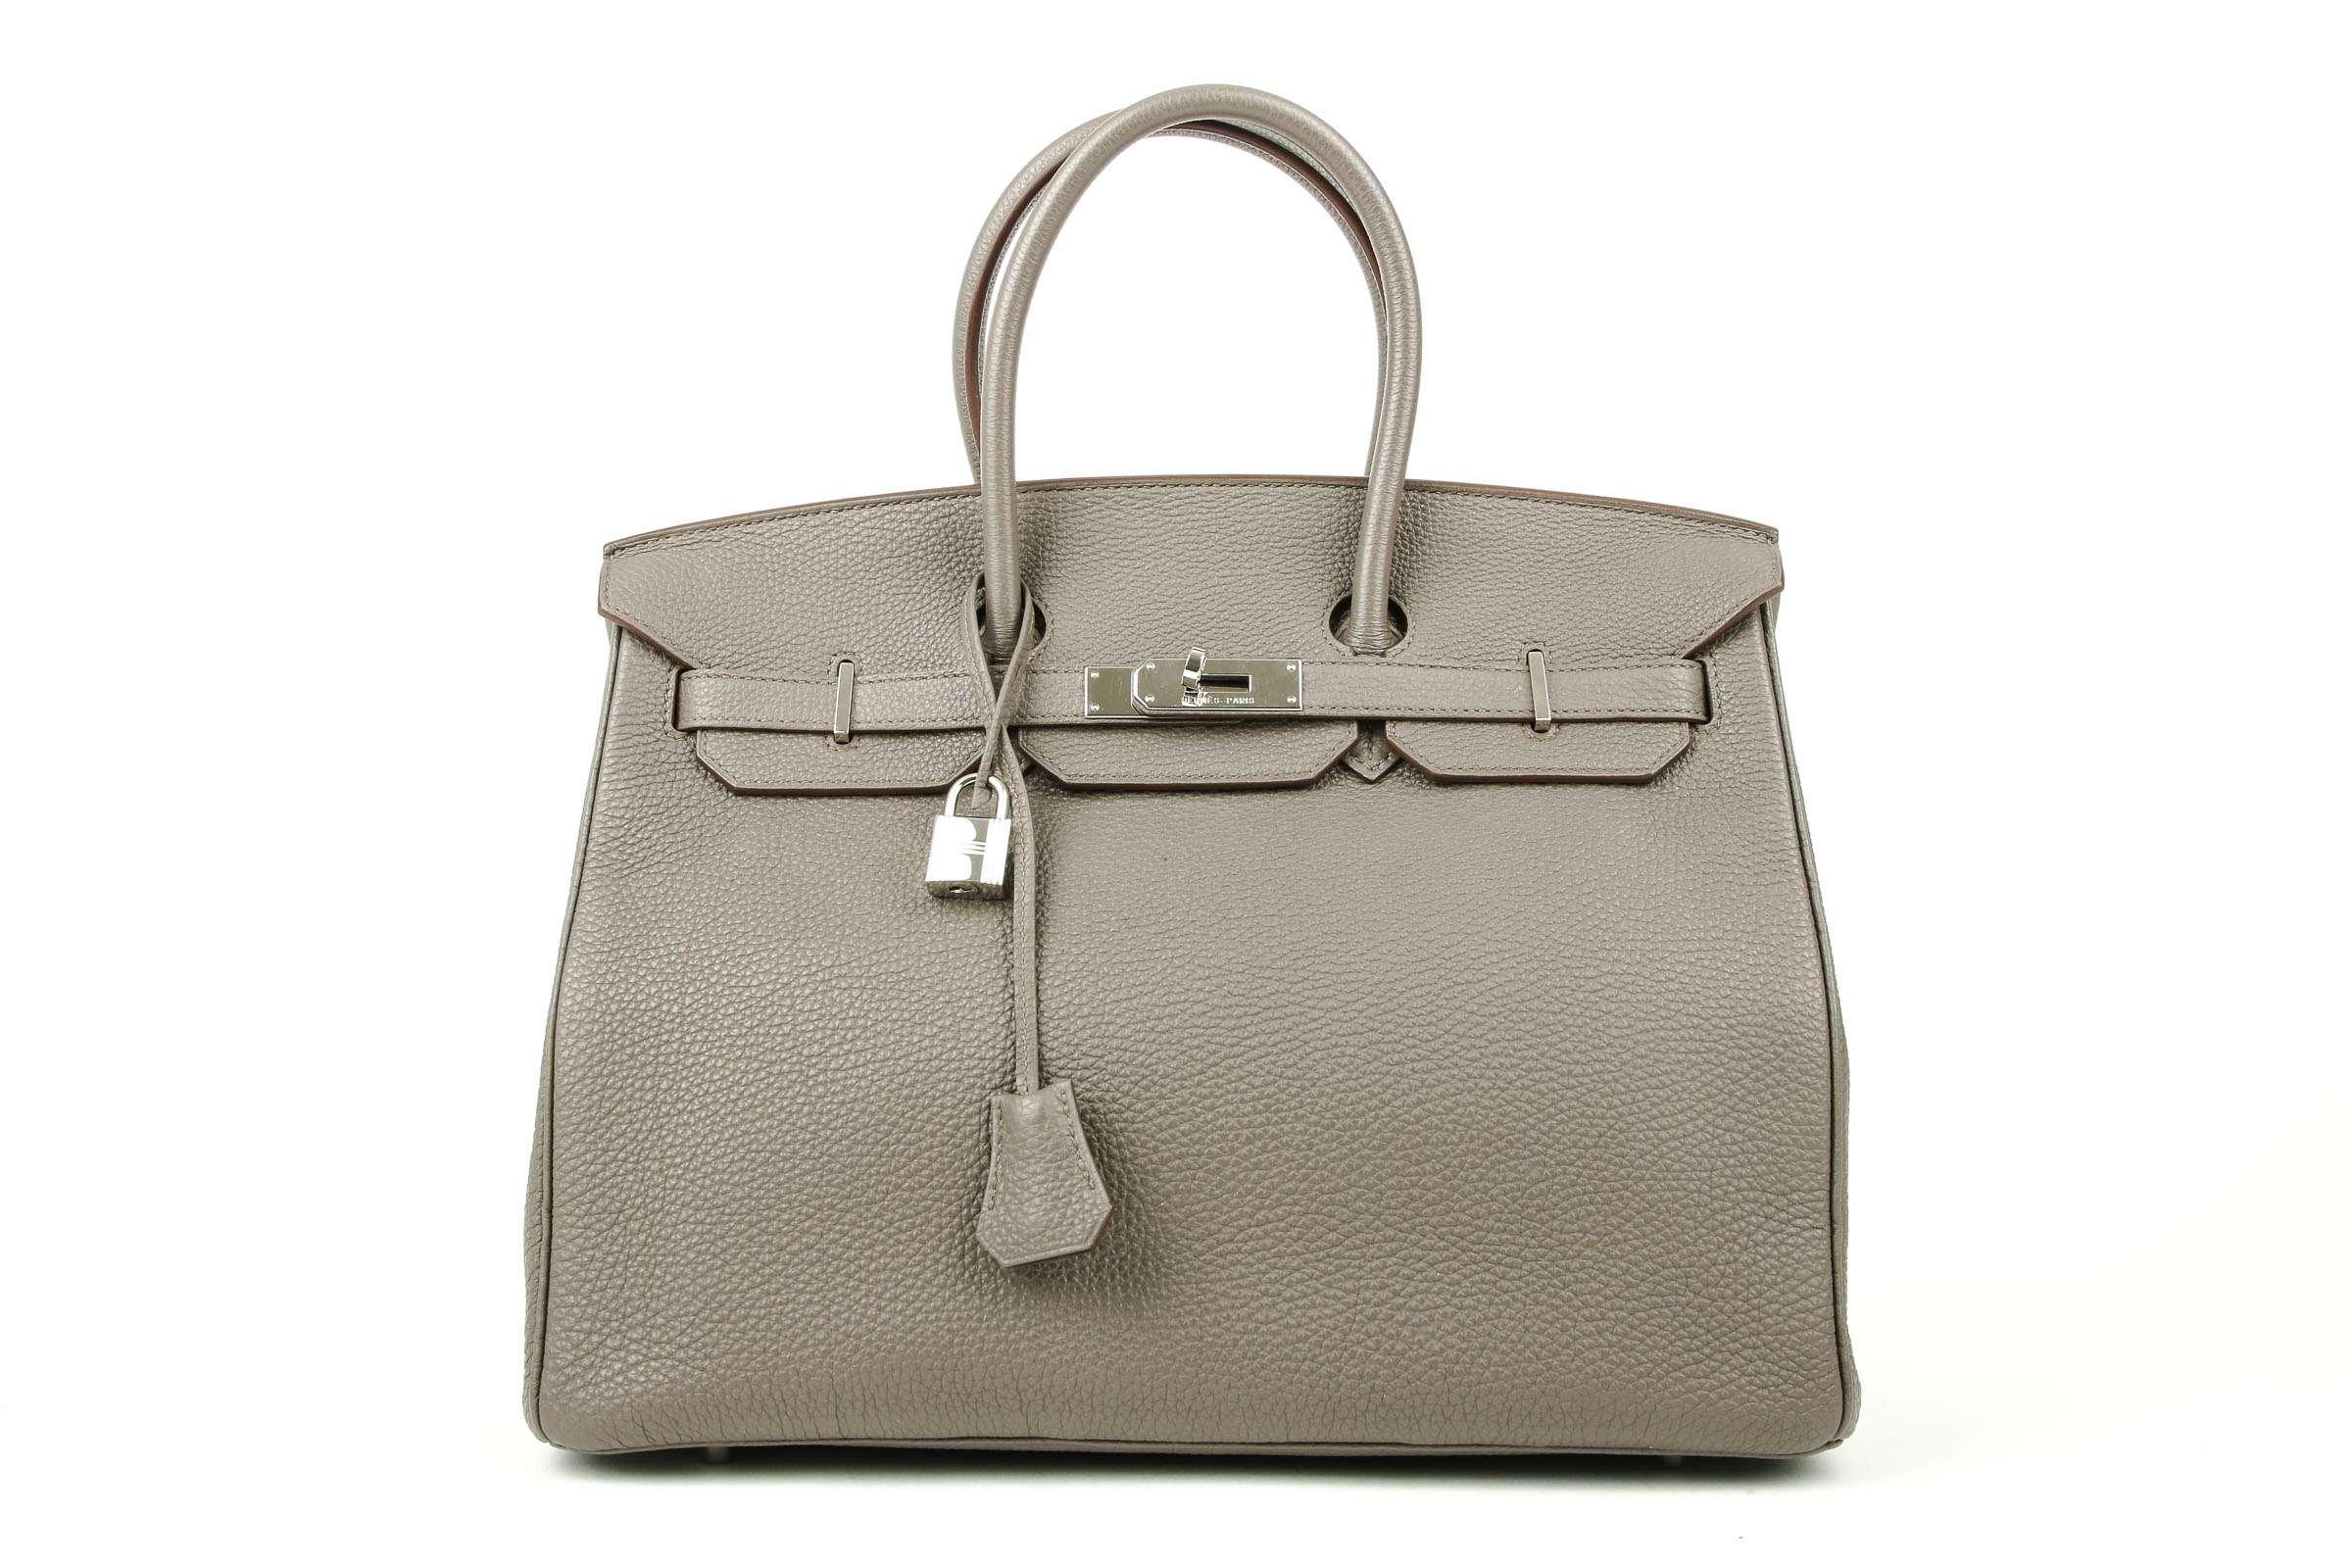 8f1b37d9a545 Hermès Birkin 35 Etain Togo leather